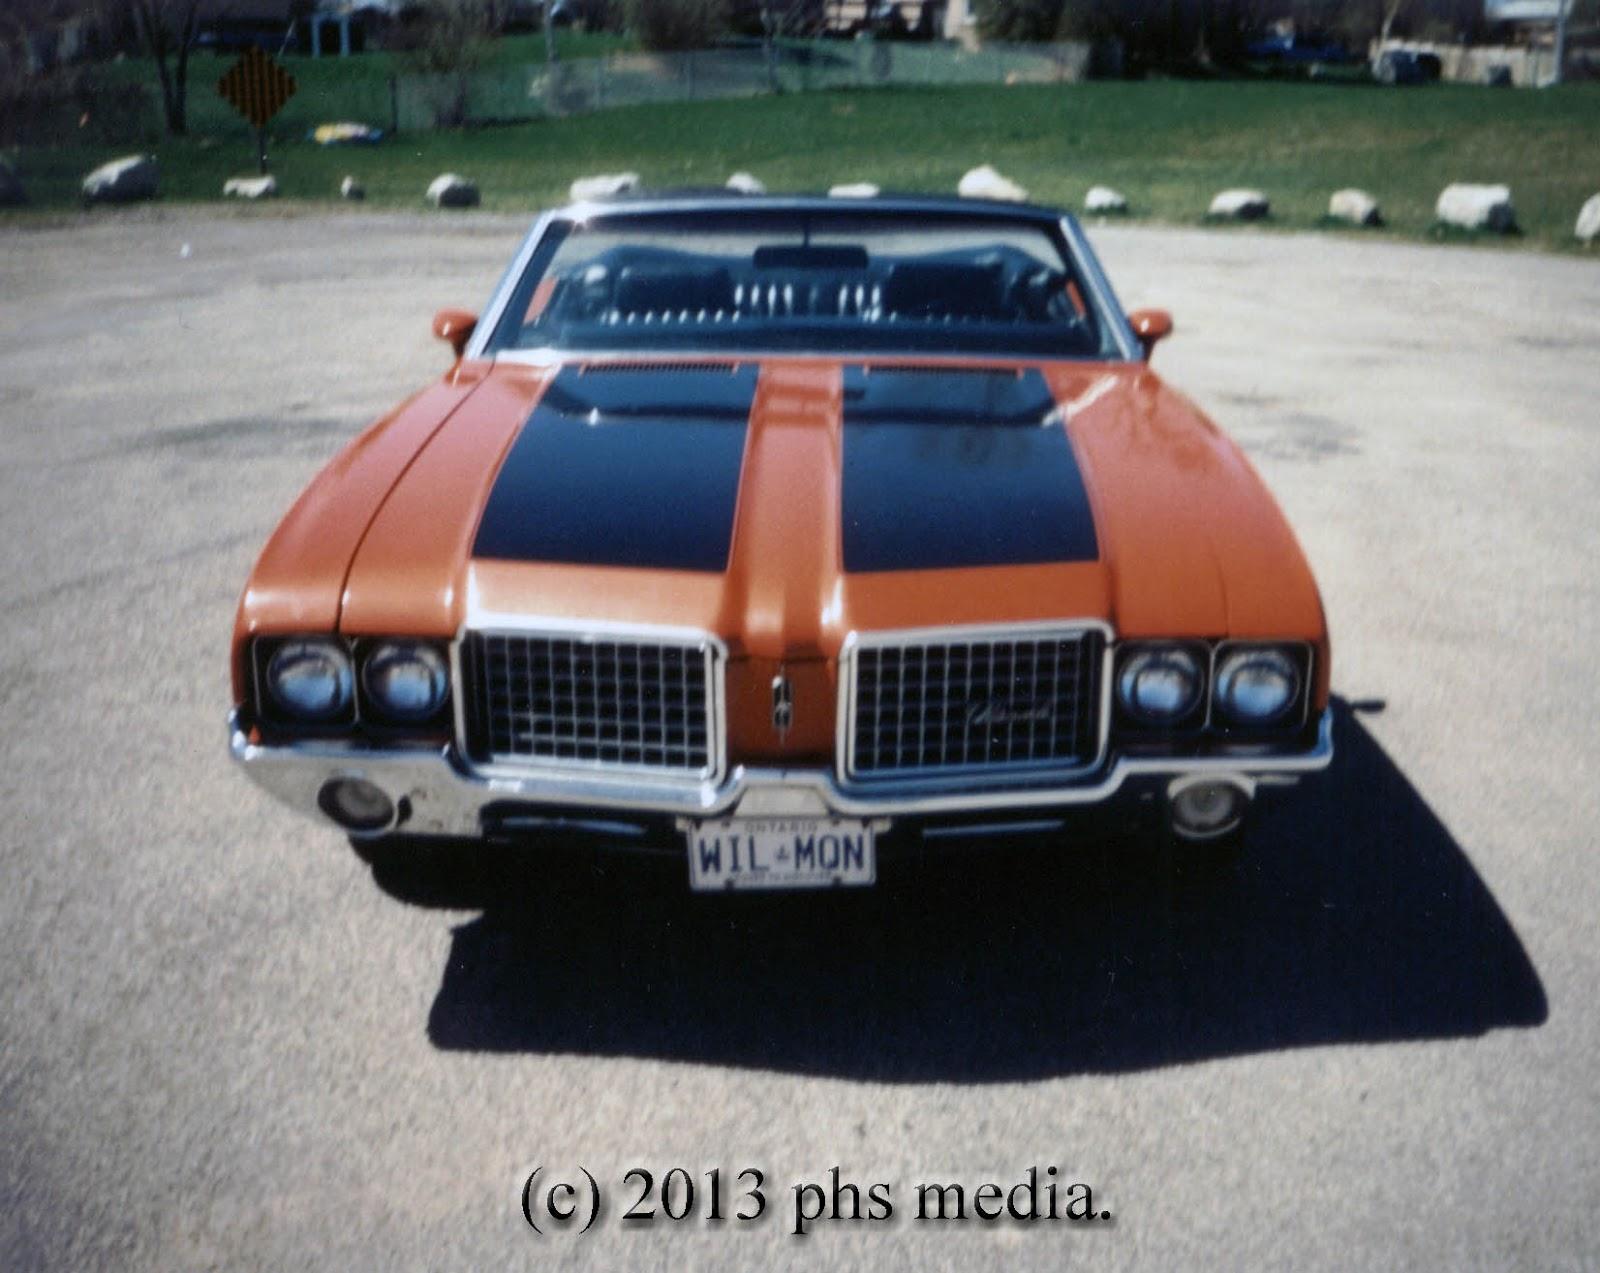 1972 cutlass supreme convertible 455 phscollectorcarworld rh phscollectorcarworld blogspot com